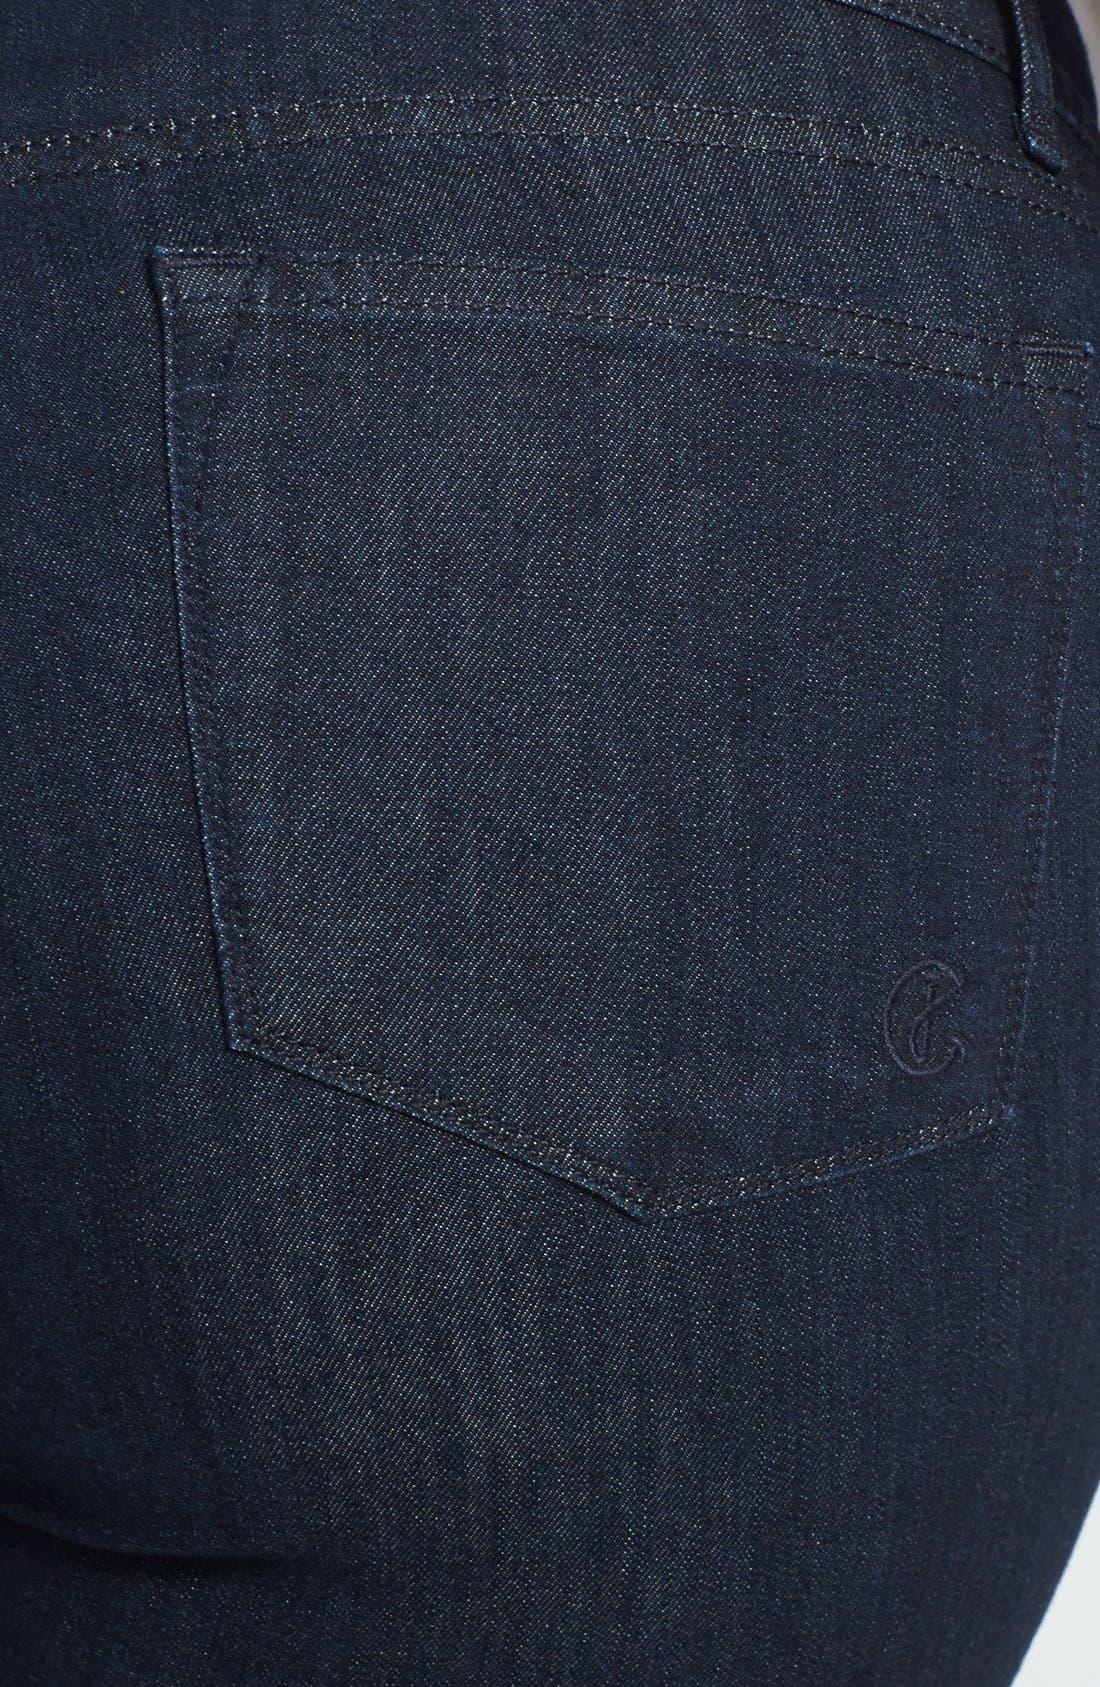 Alternate Image 3  - CJ by Cookie Johnson 'Grace' Bootcut Stretch Jeans (Plus Size)